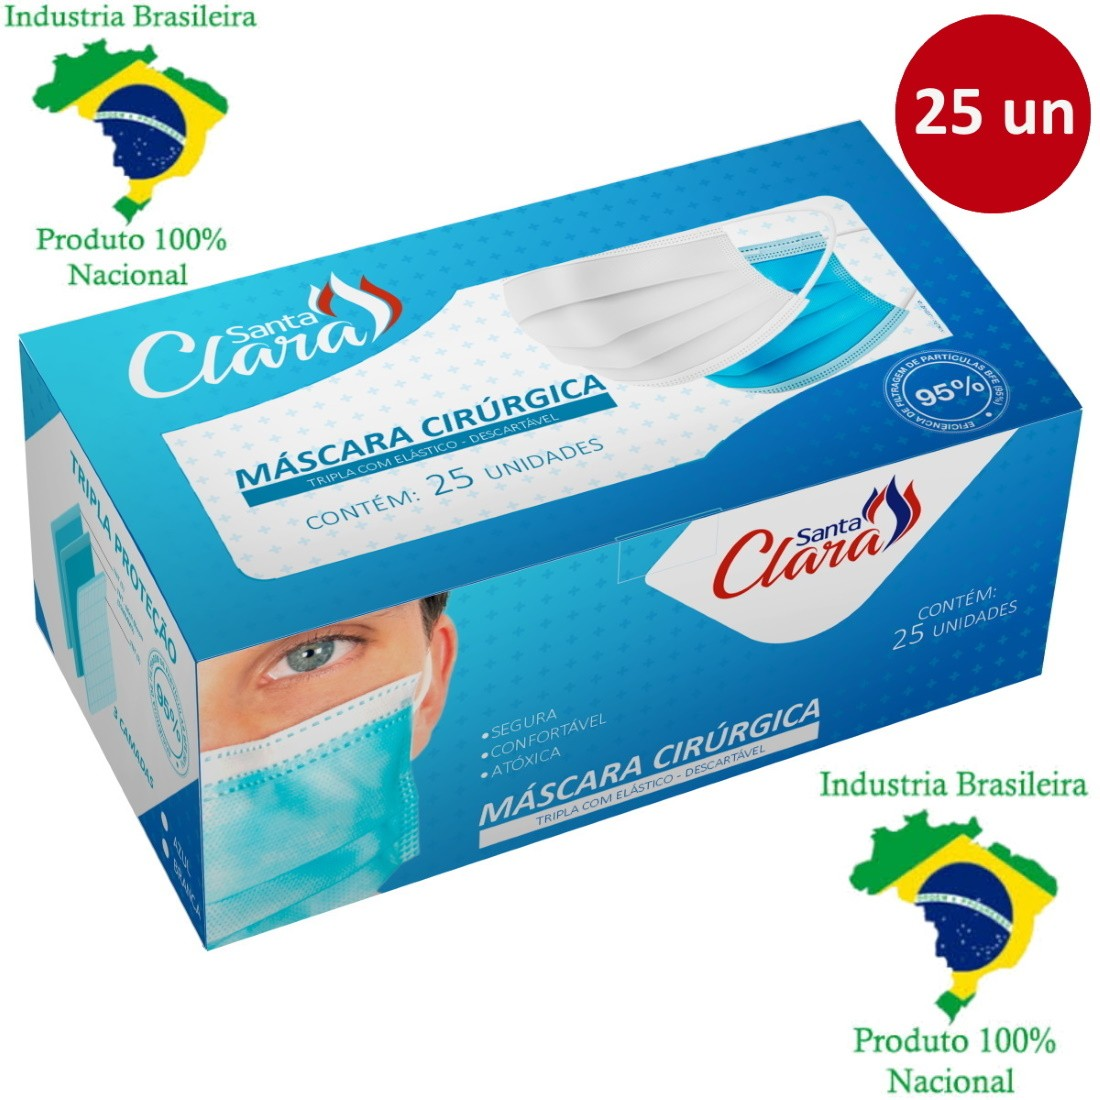 Máscara Cirúrgica Descartável TNT Tripla com Elástico Clipe Nasal e Anvisa 25 Un - Santa Clara